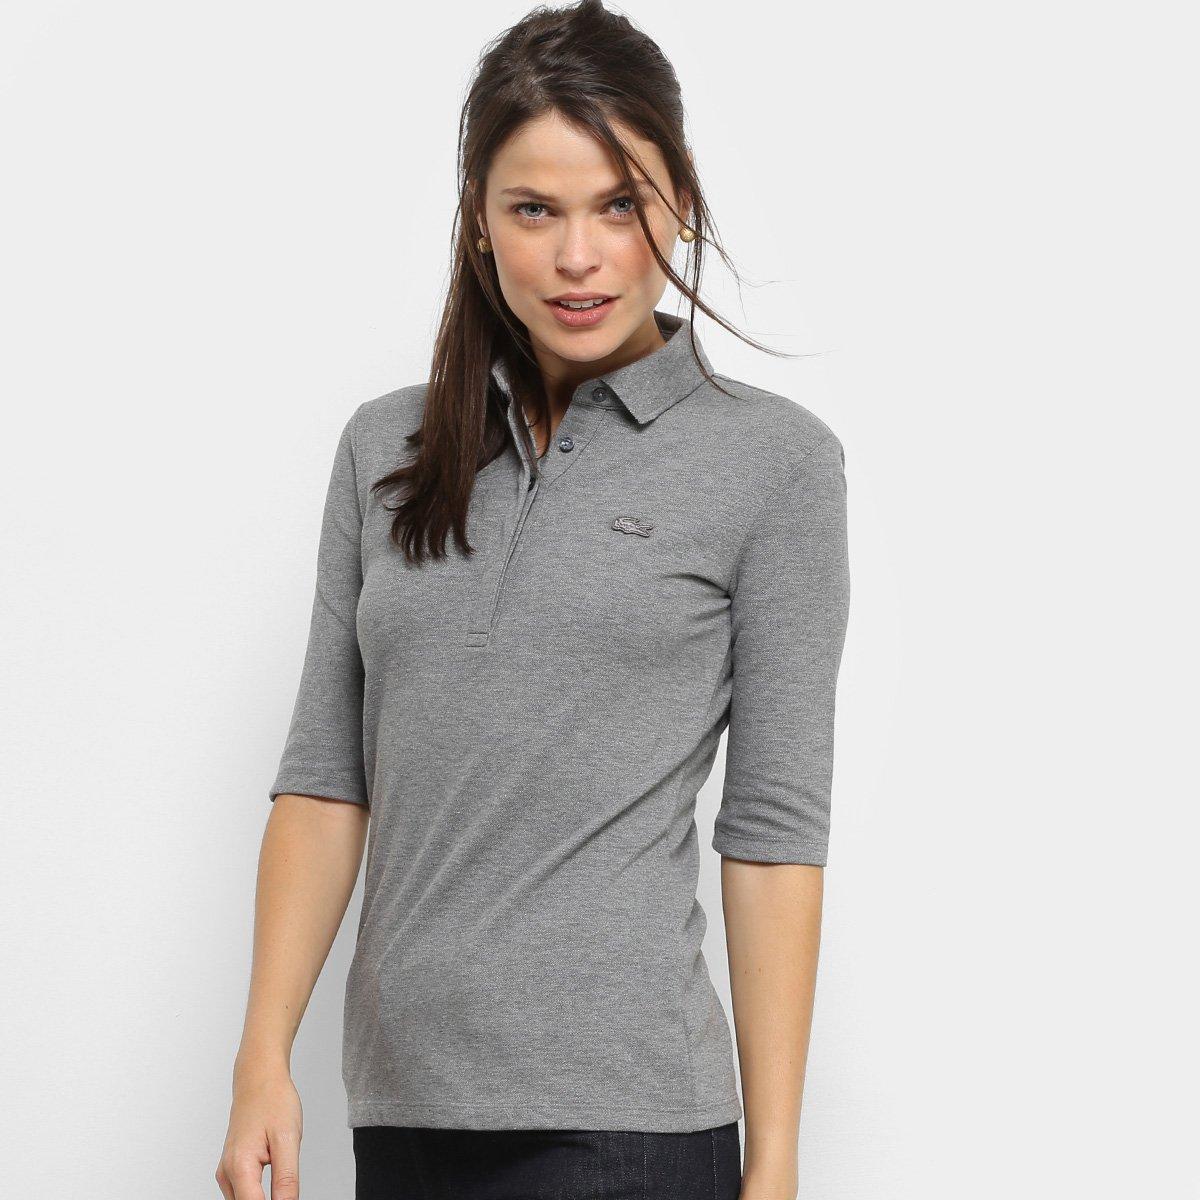 Camisa Polo Lacoste Manga 3 4 Botões Feminina - Compre Agora   Zattini 5799e6f450